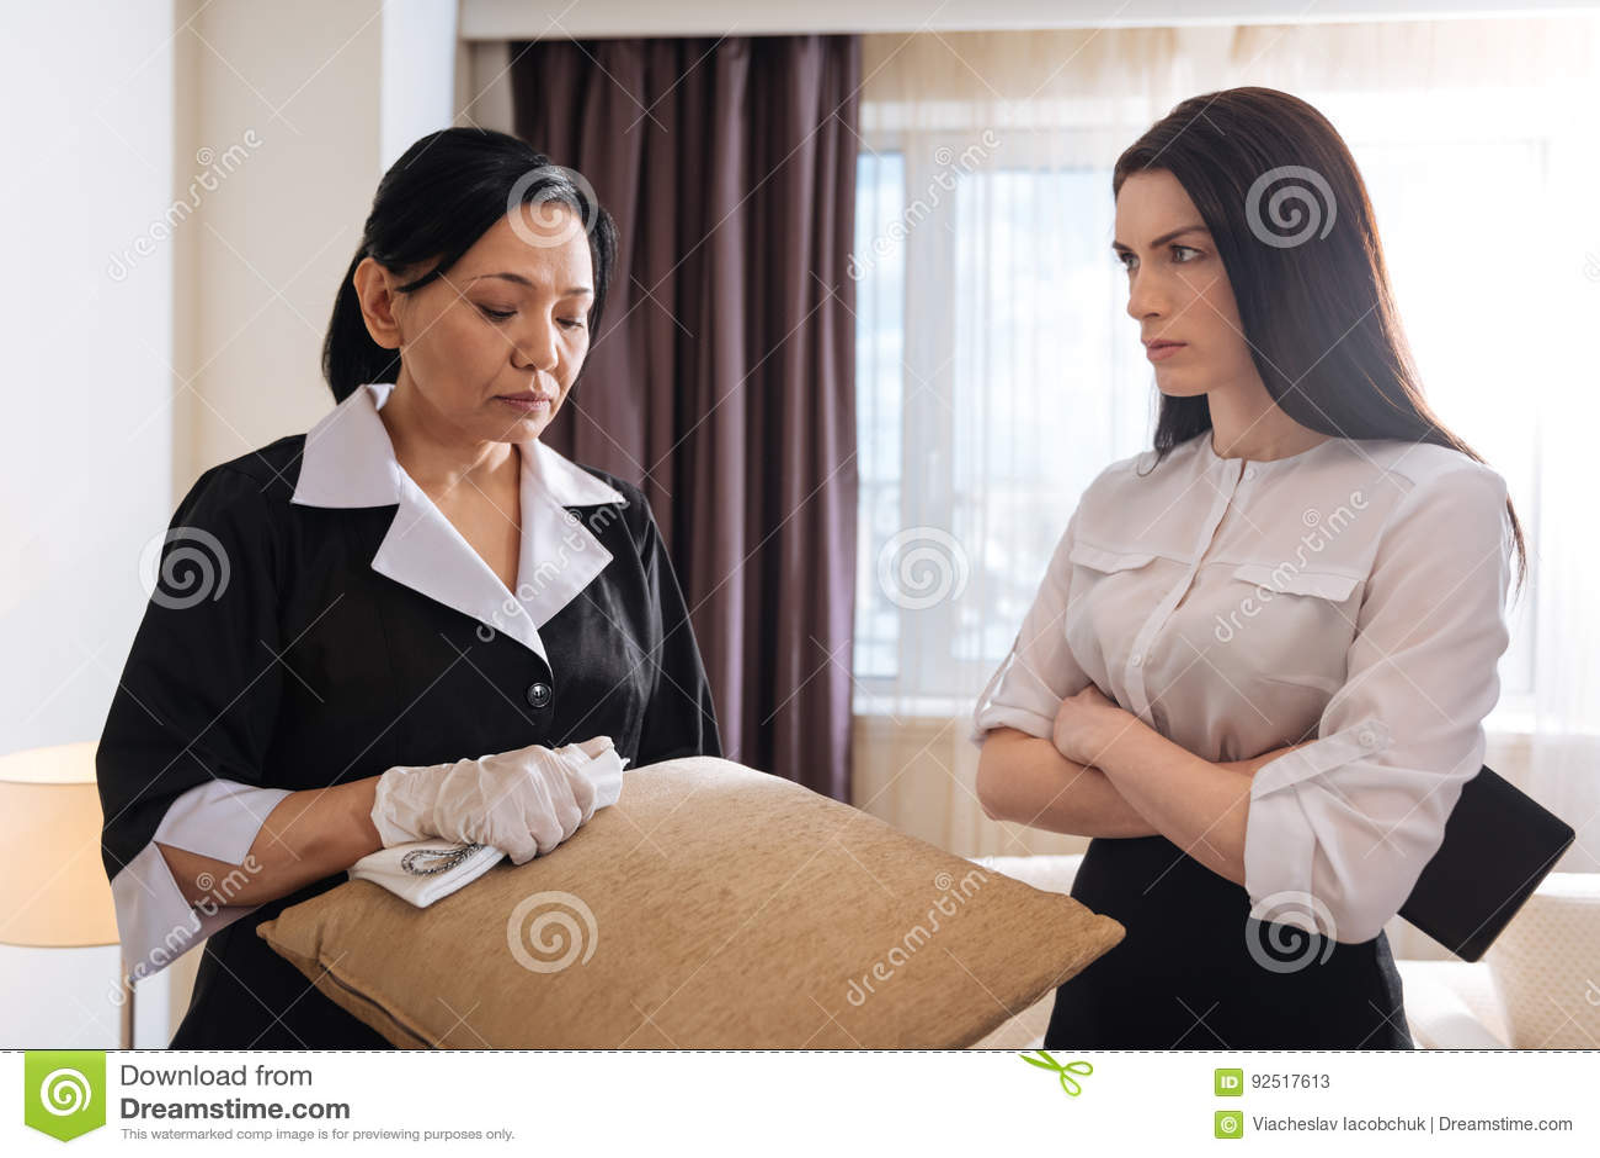 Nice unhappy hotel maid holding a cushion